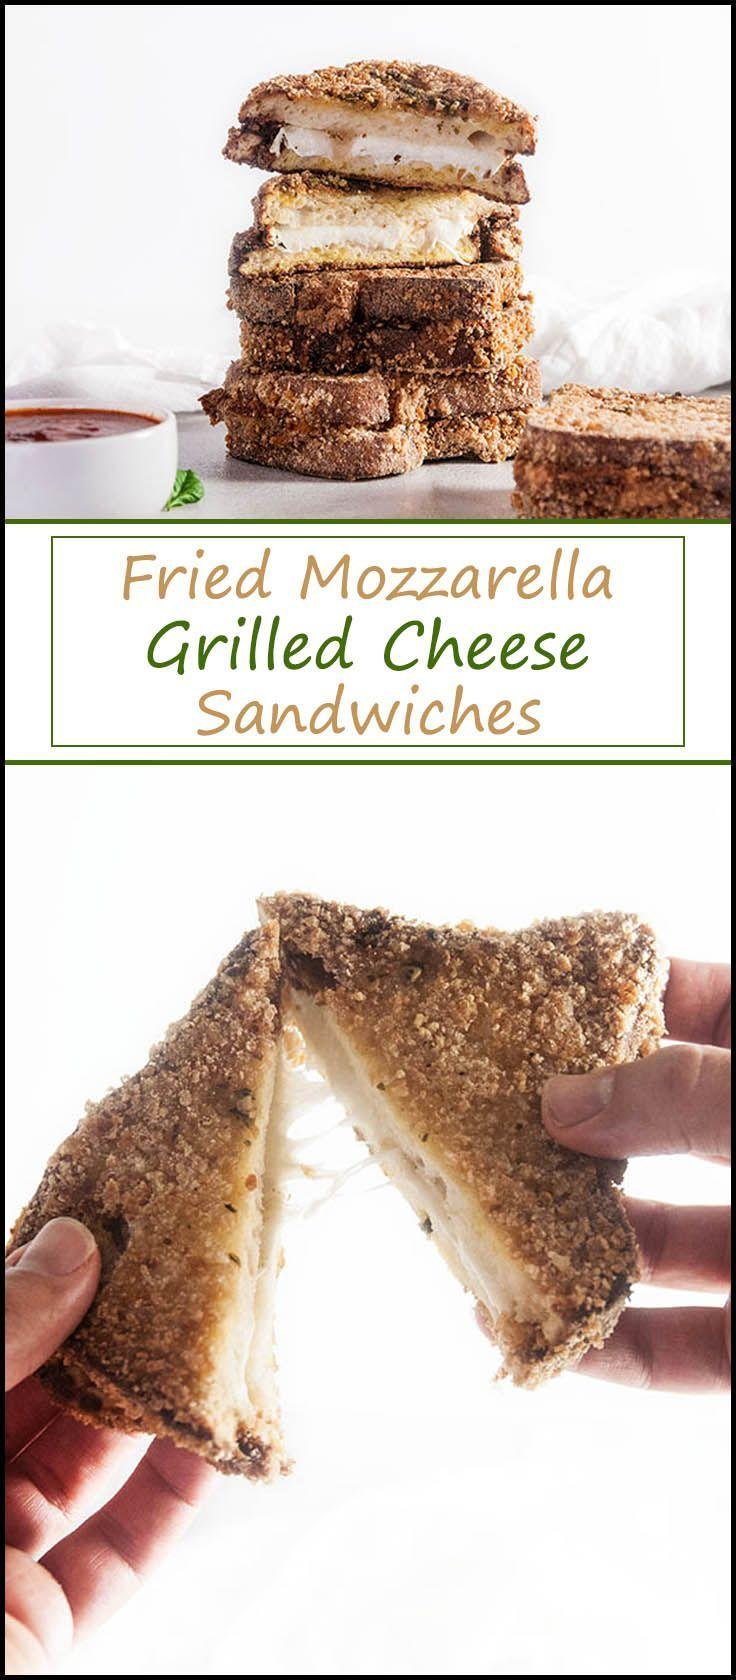 Fried Mozzarella Grilled Cheese from www.seasonedsprinkles.com